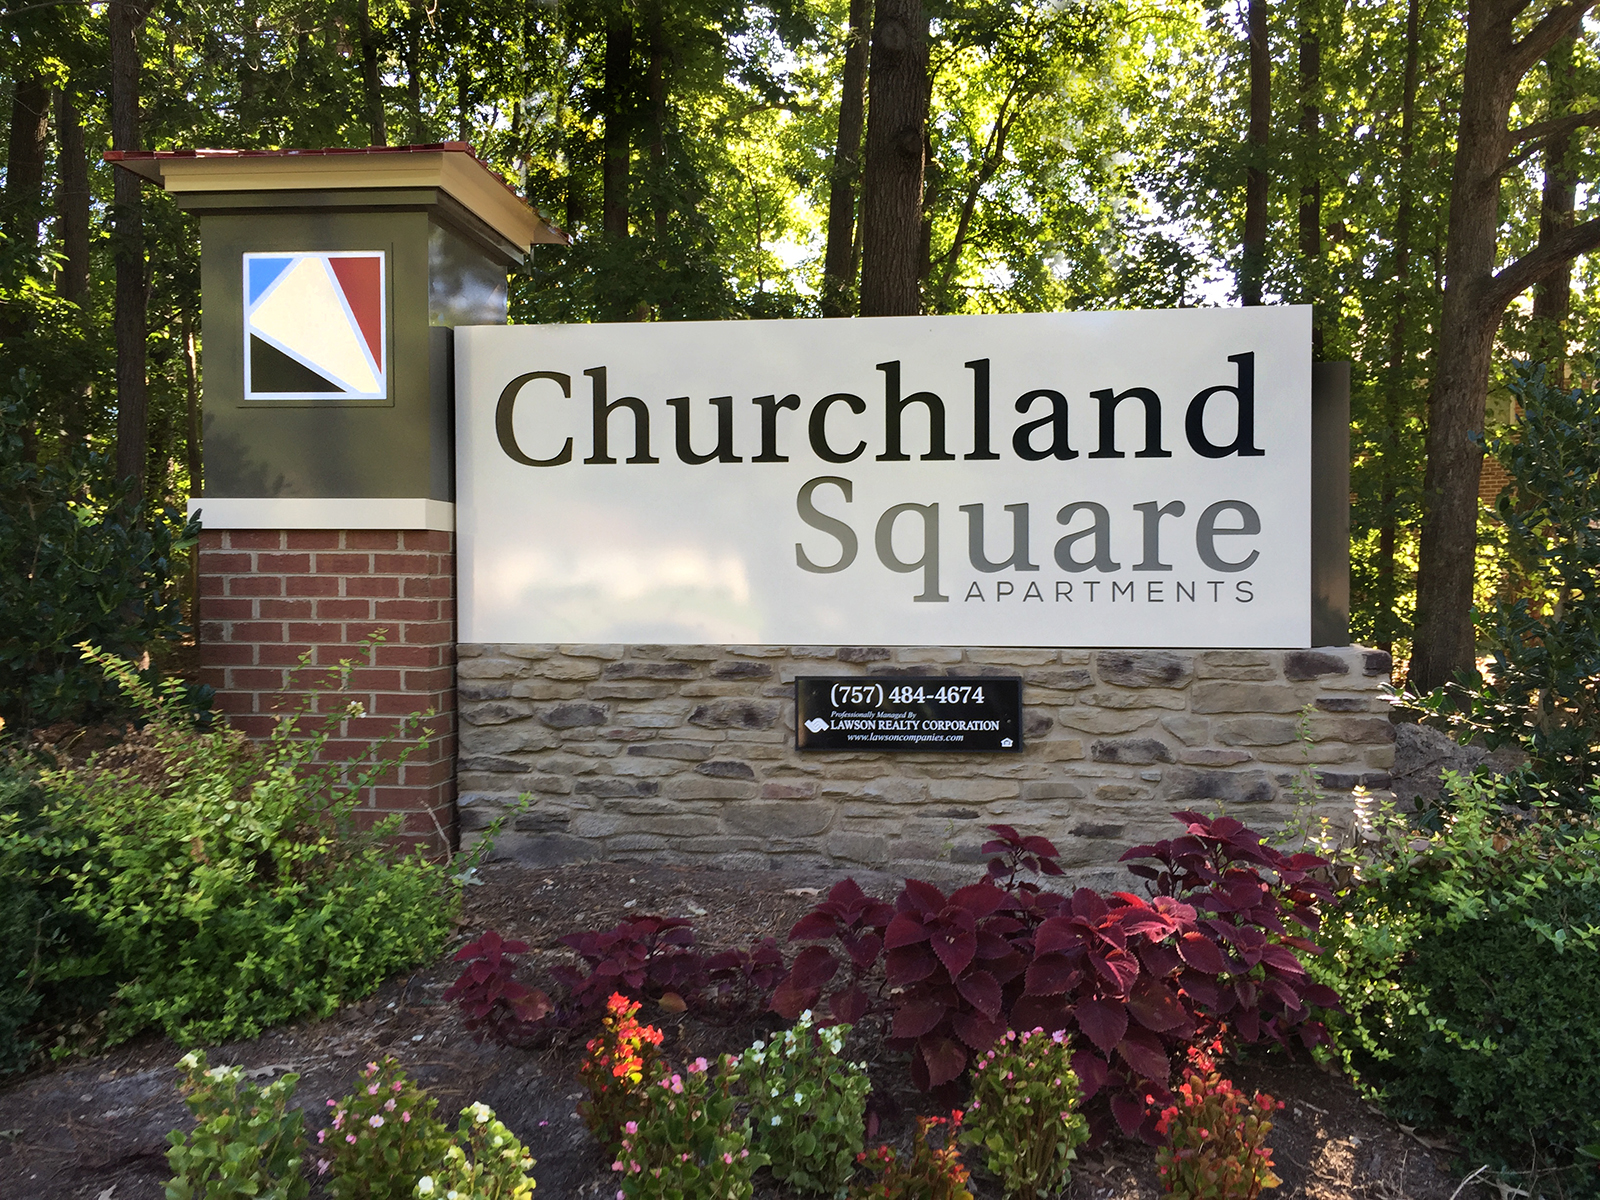 Churchland Square Apartments